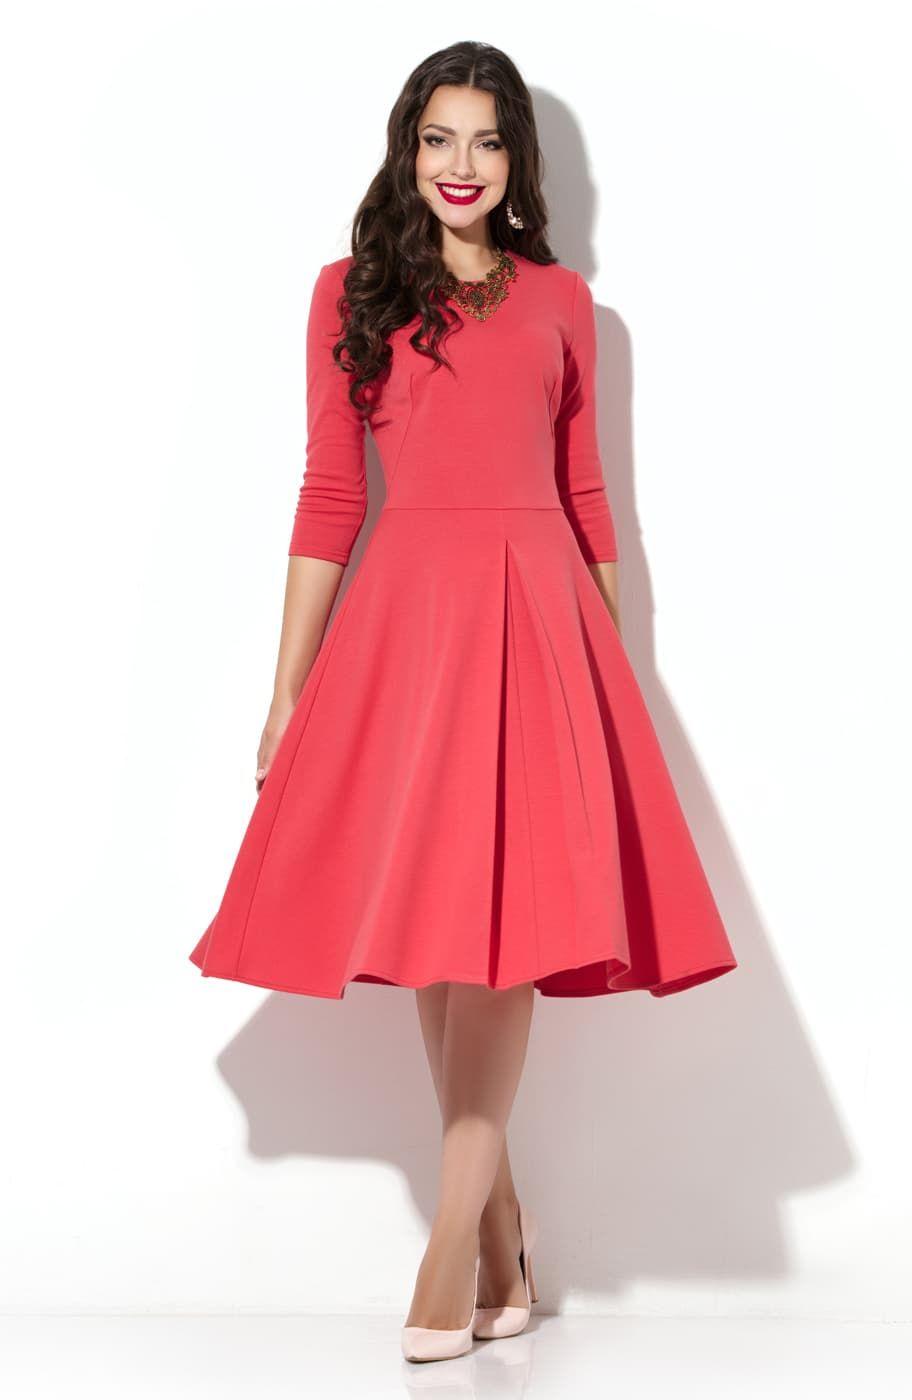 fa22d77765e Платье из джерси Donna-Saggia DSP-195-30t от производителя